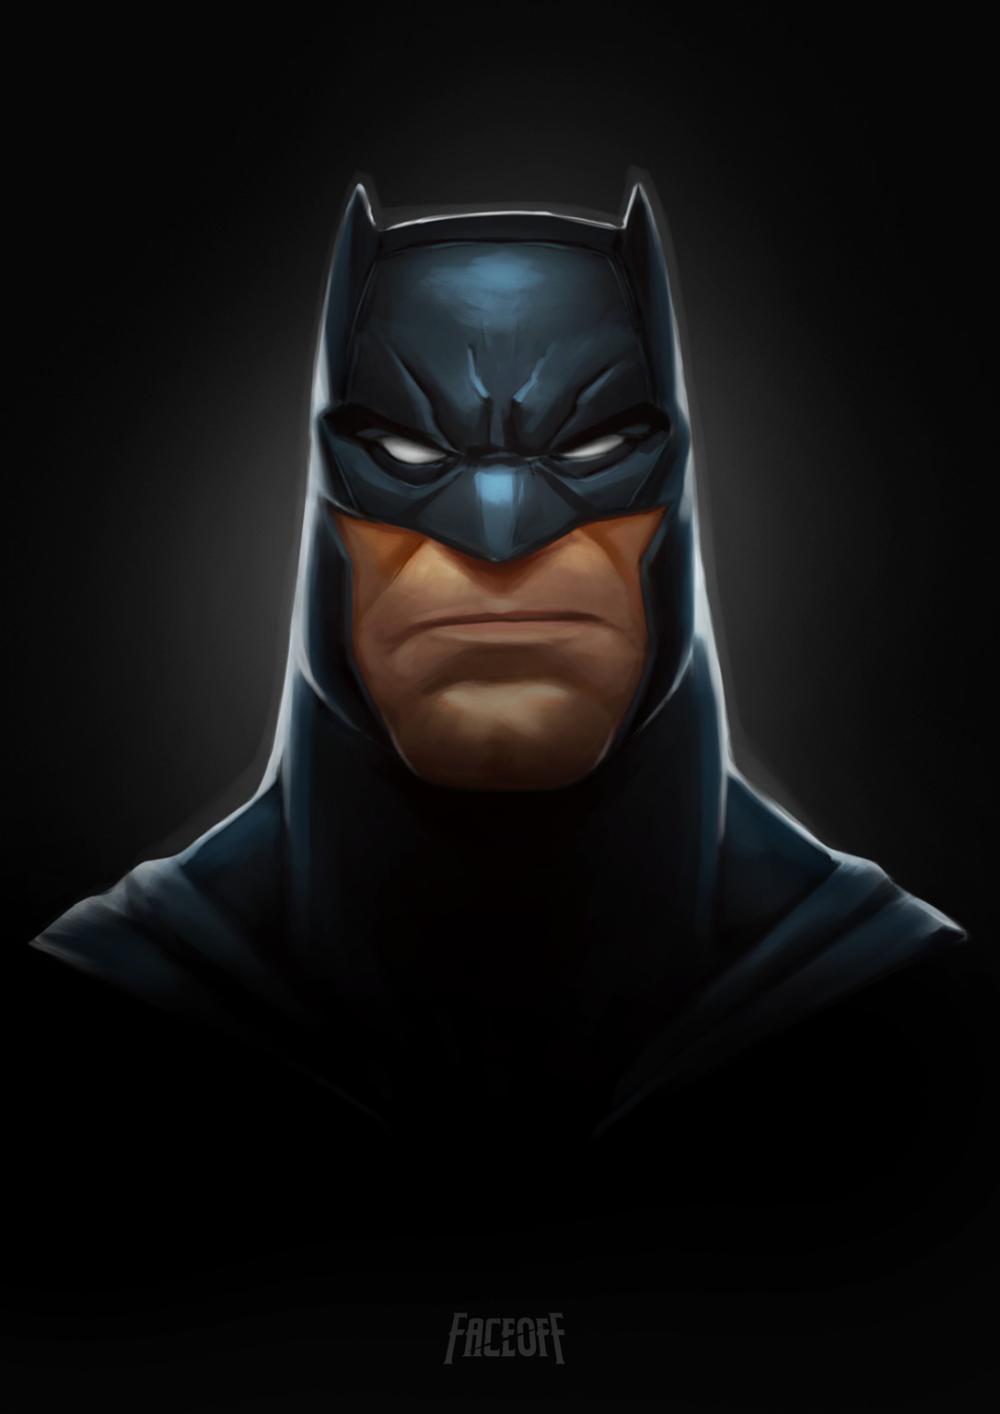 Artstation Batman Faceoff Corey Smith Joker Iphone Wallpaper Batman Batman Wallpaper